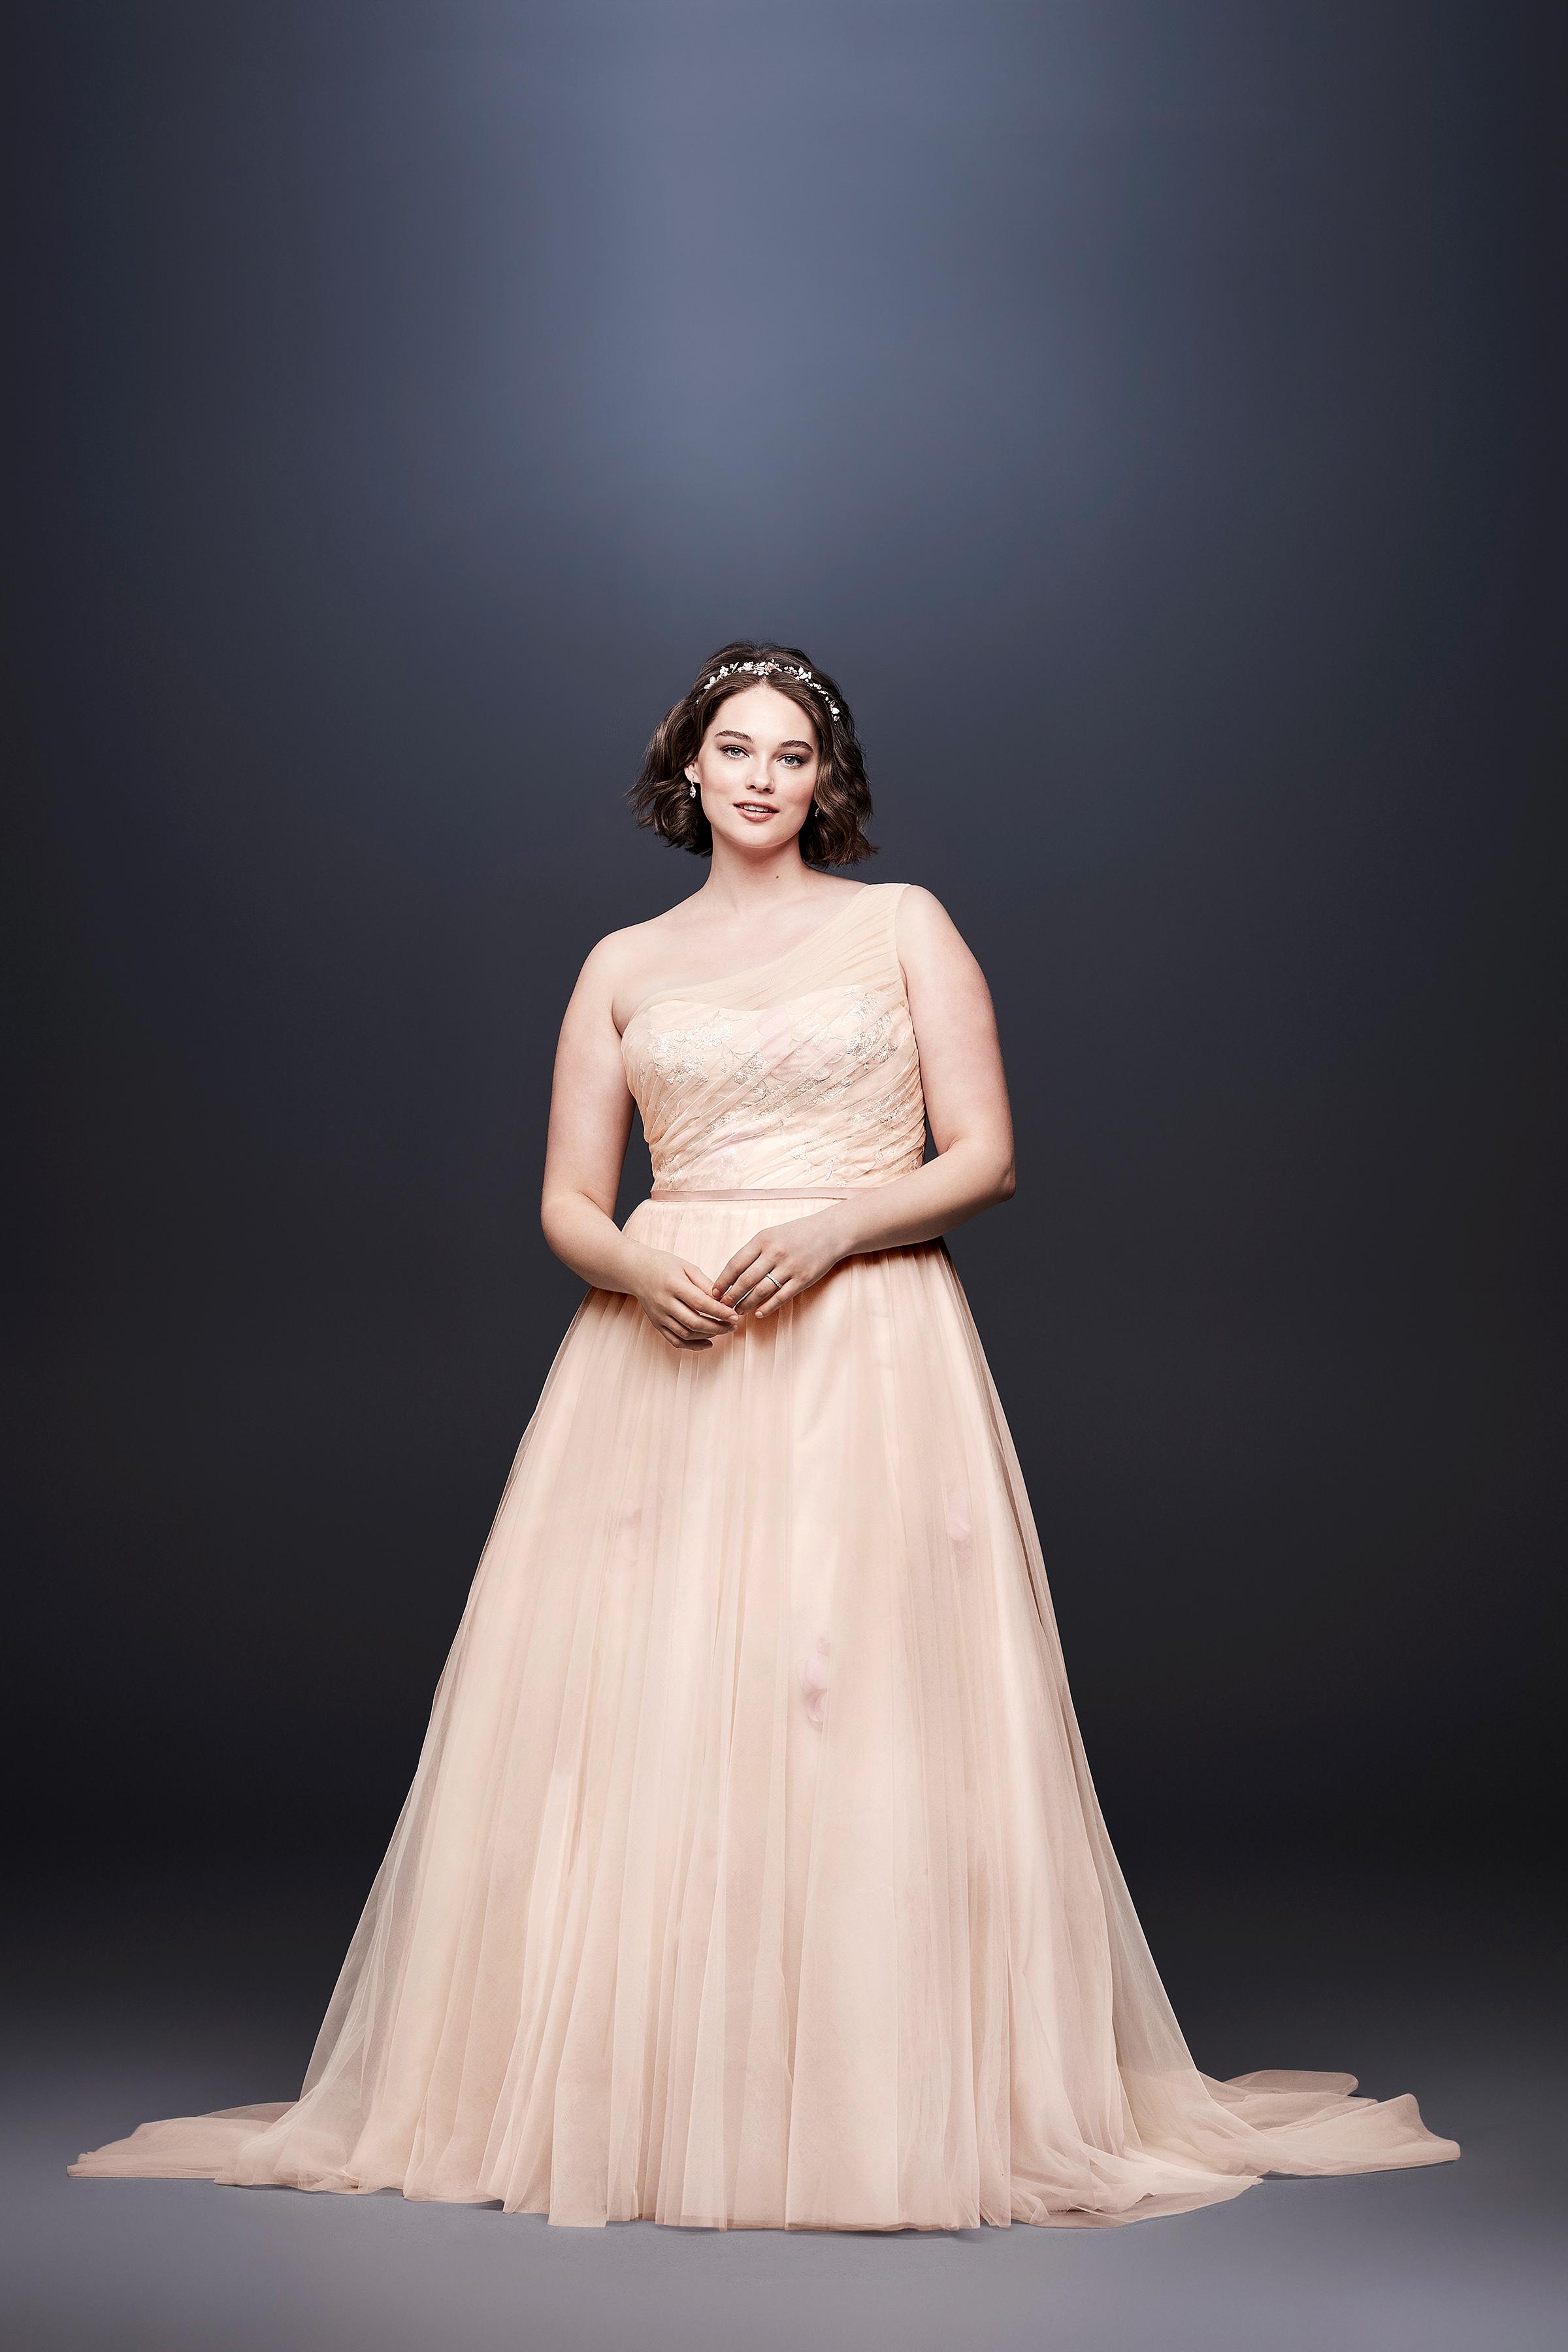 david bridal wedding dress spring 2019 a-line peach one shoulder